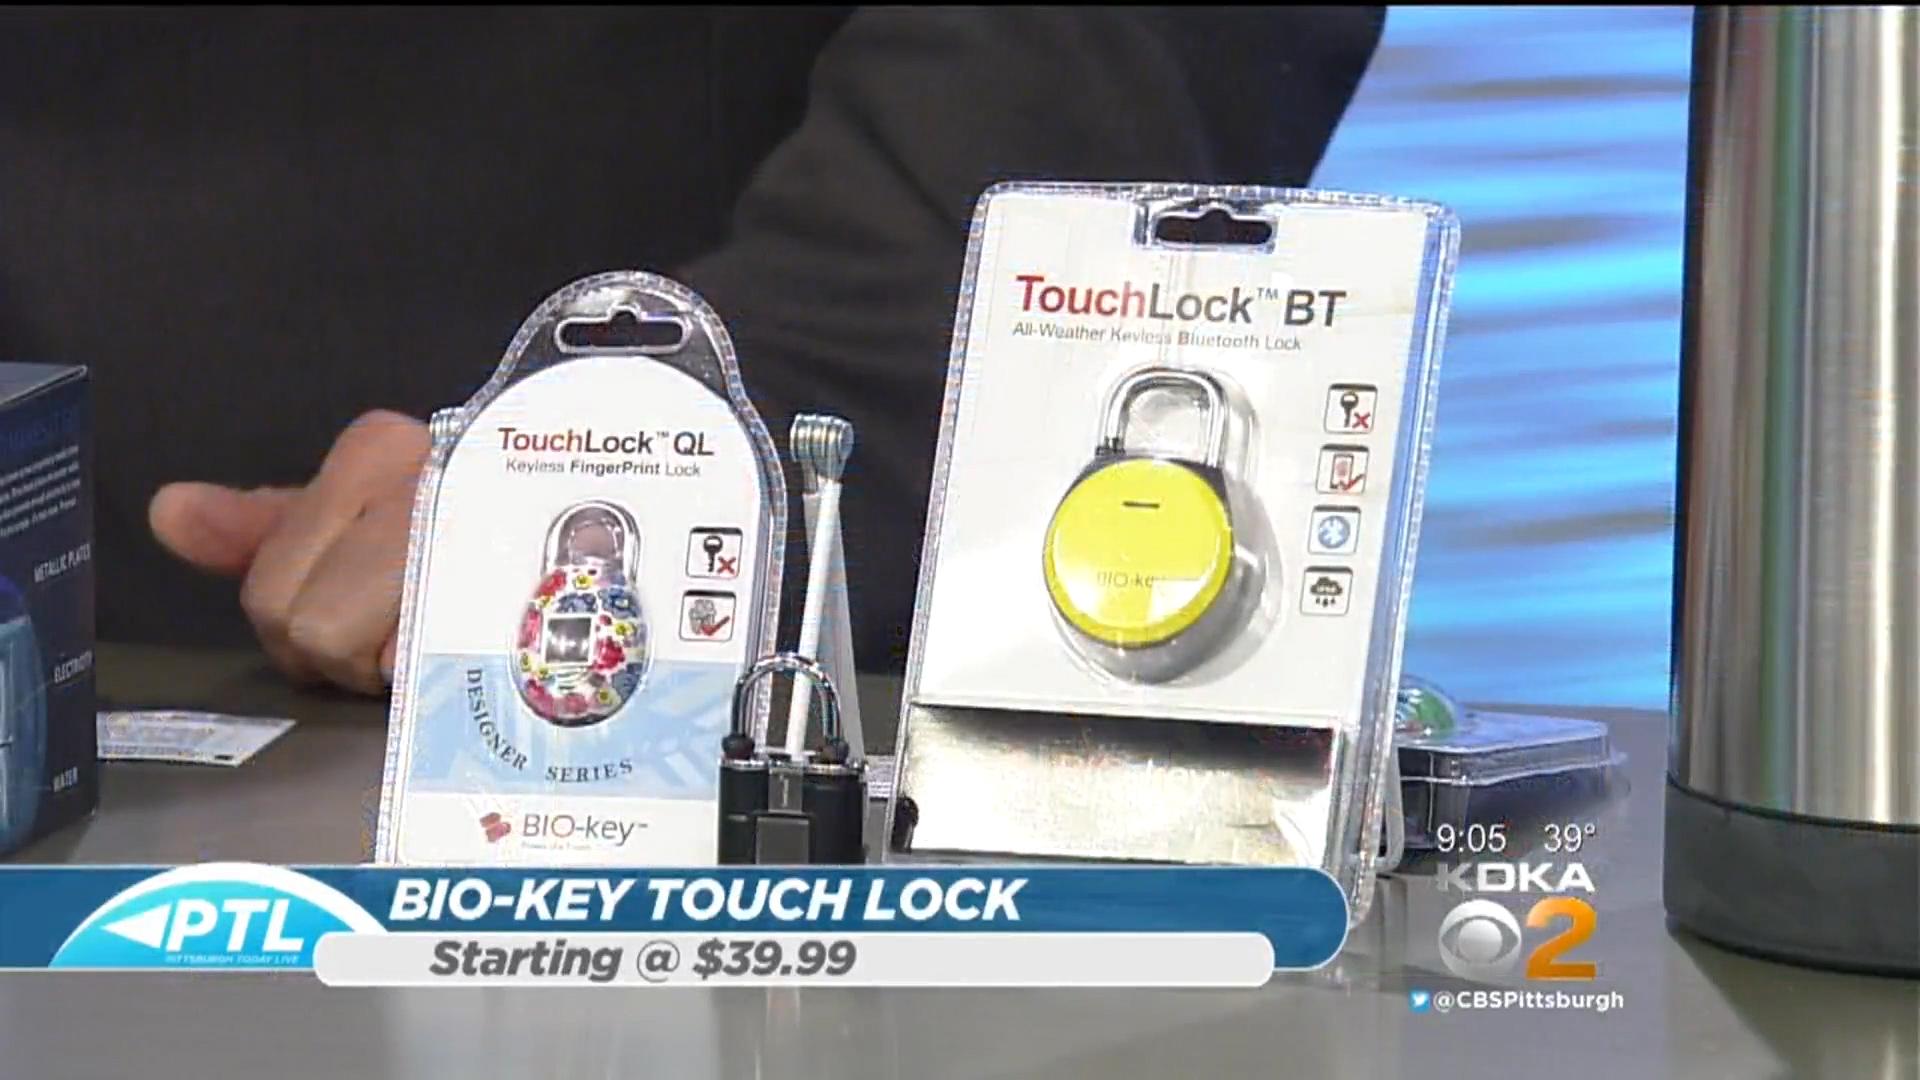 Bio-Key TouchLock - Starts at $39.99Shop Now